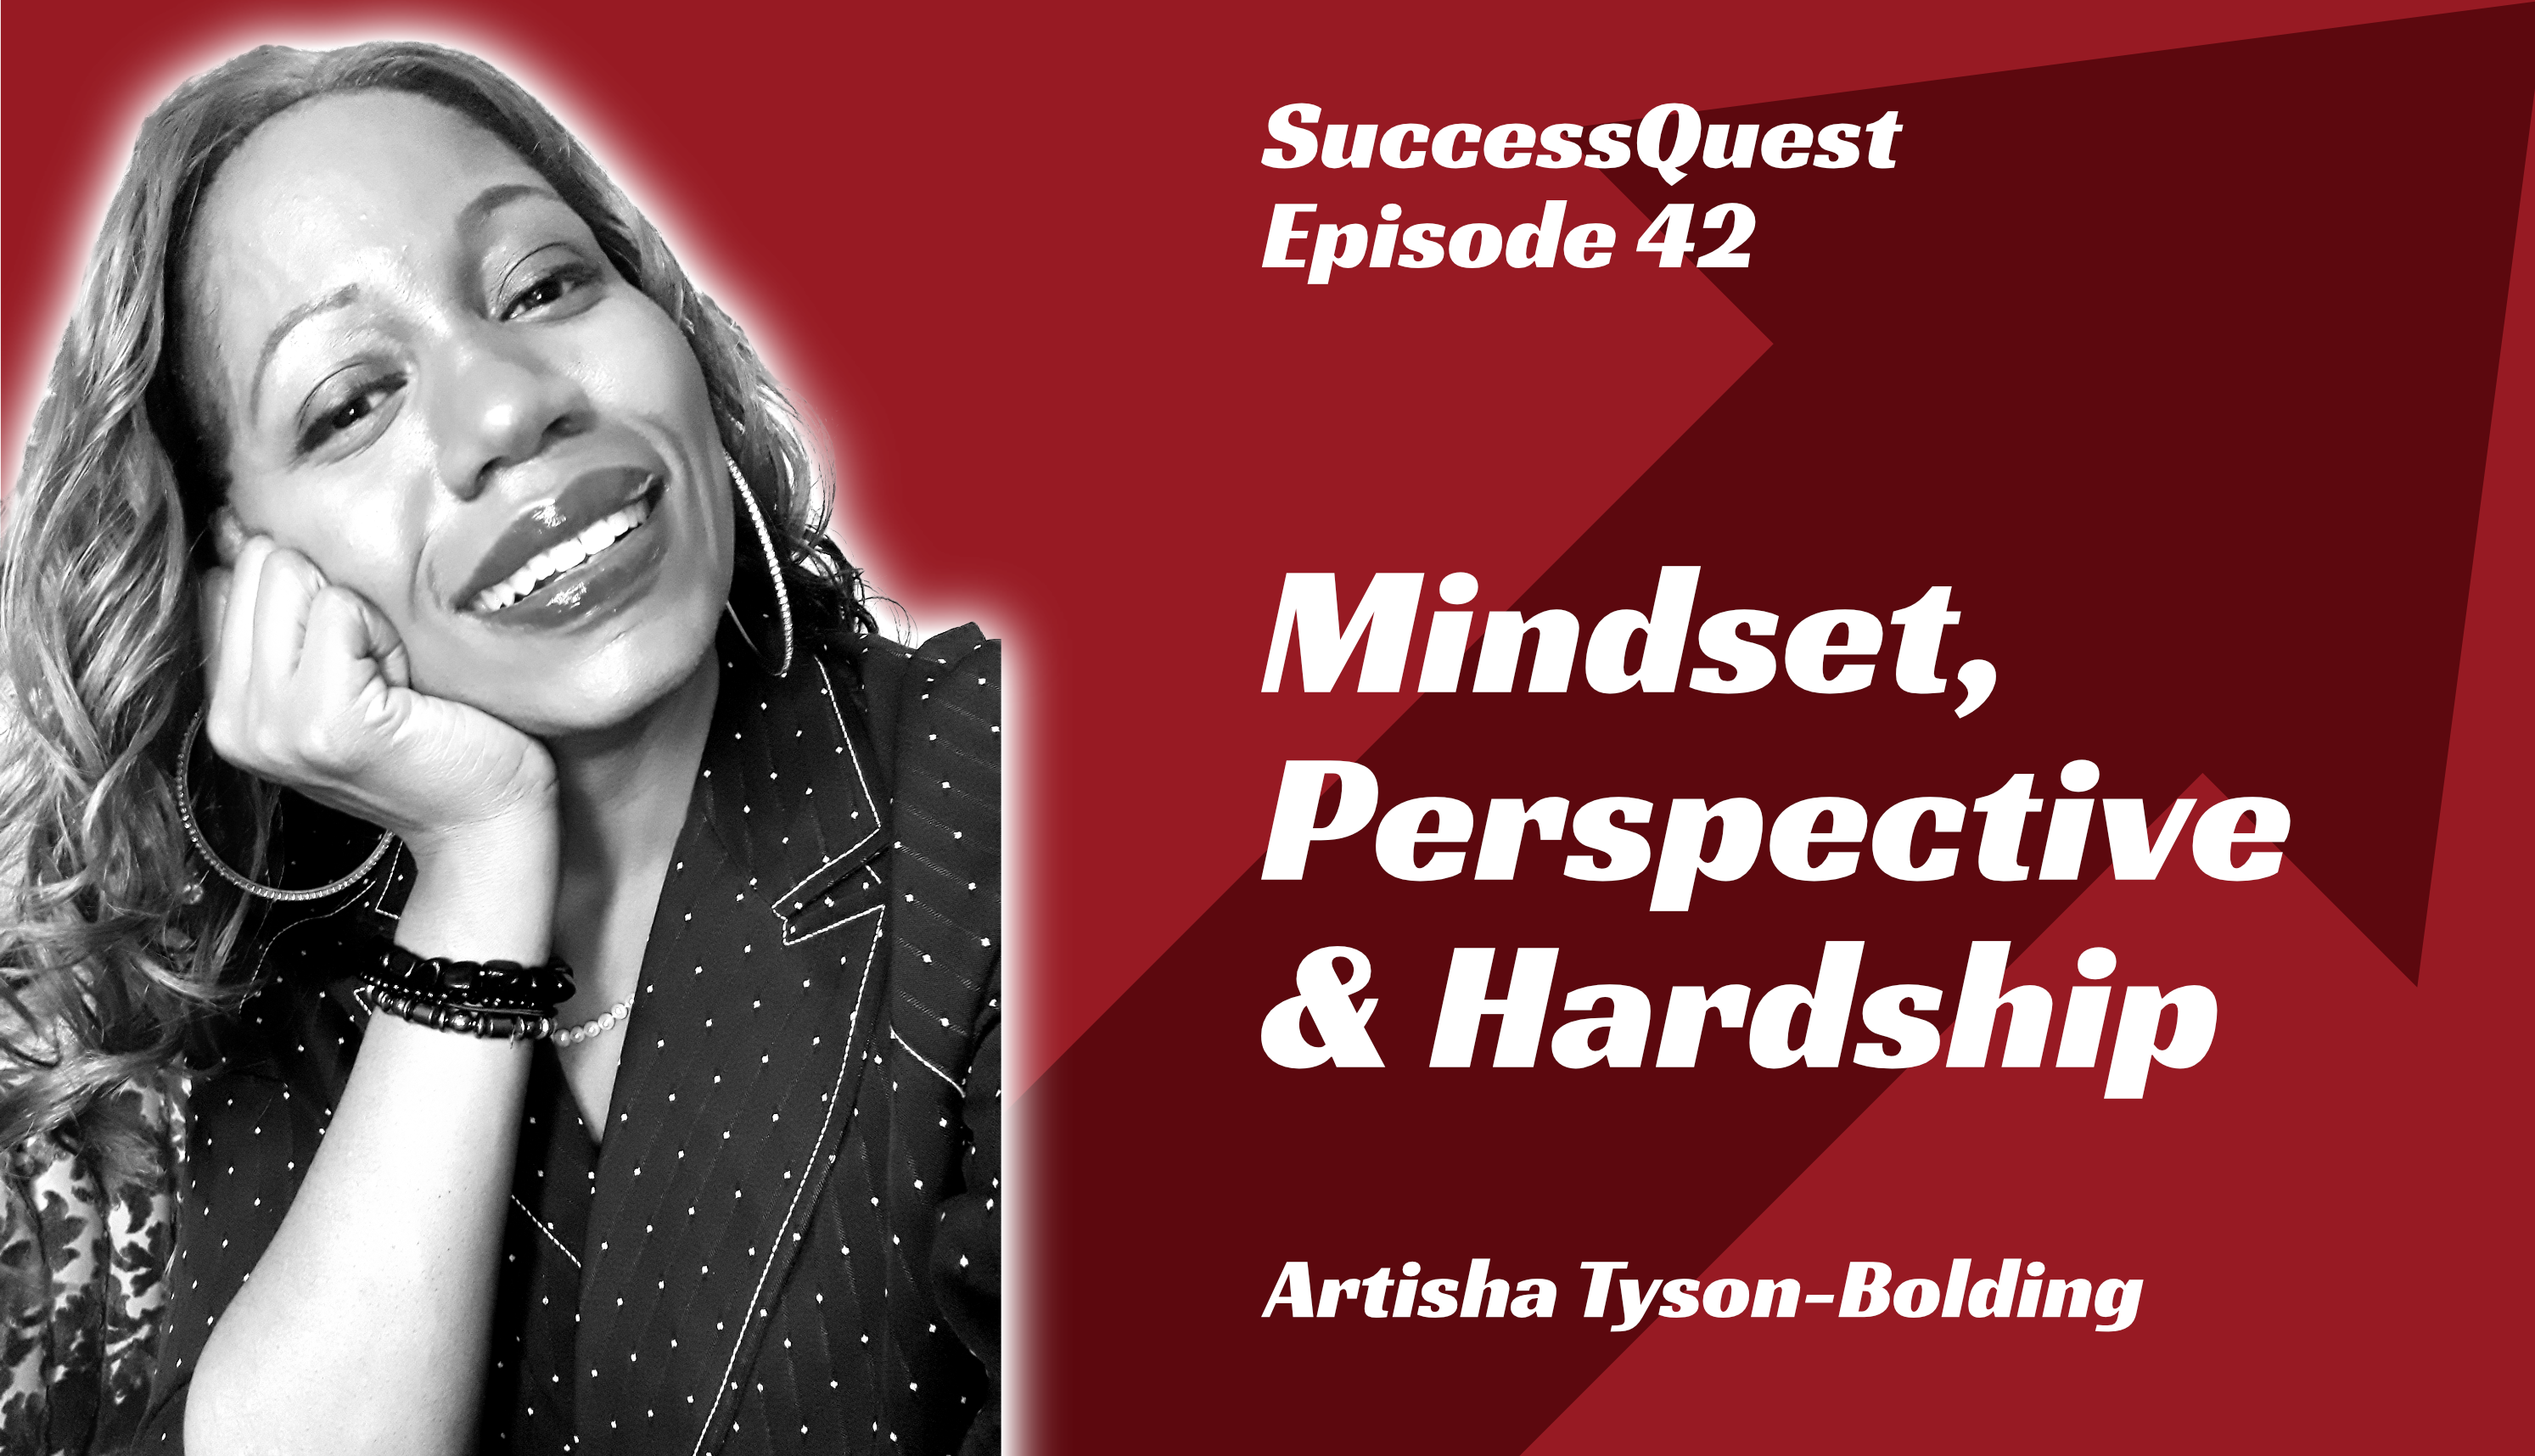 Artisha Tyson-Bolding Mindset Perspective Hardship SuccessQuest